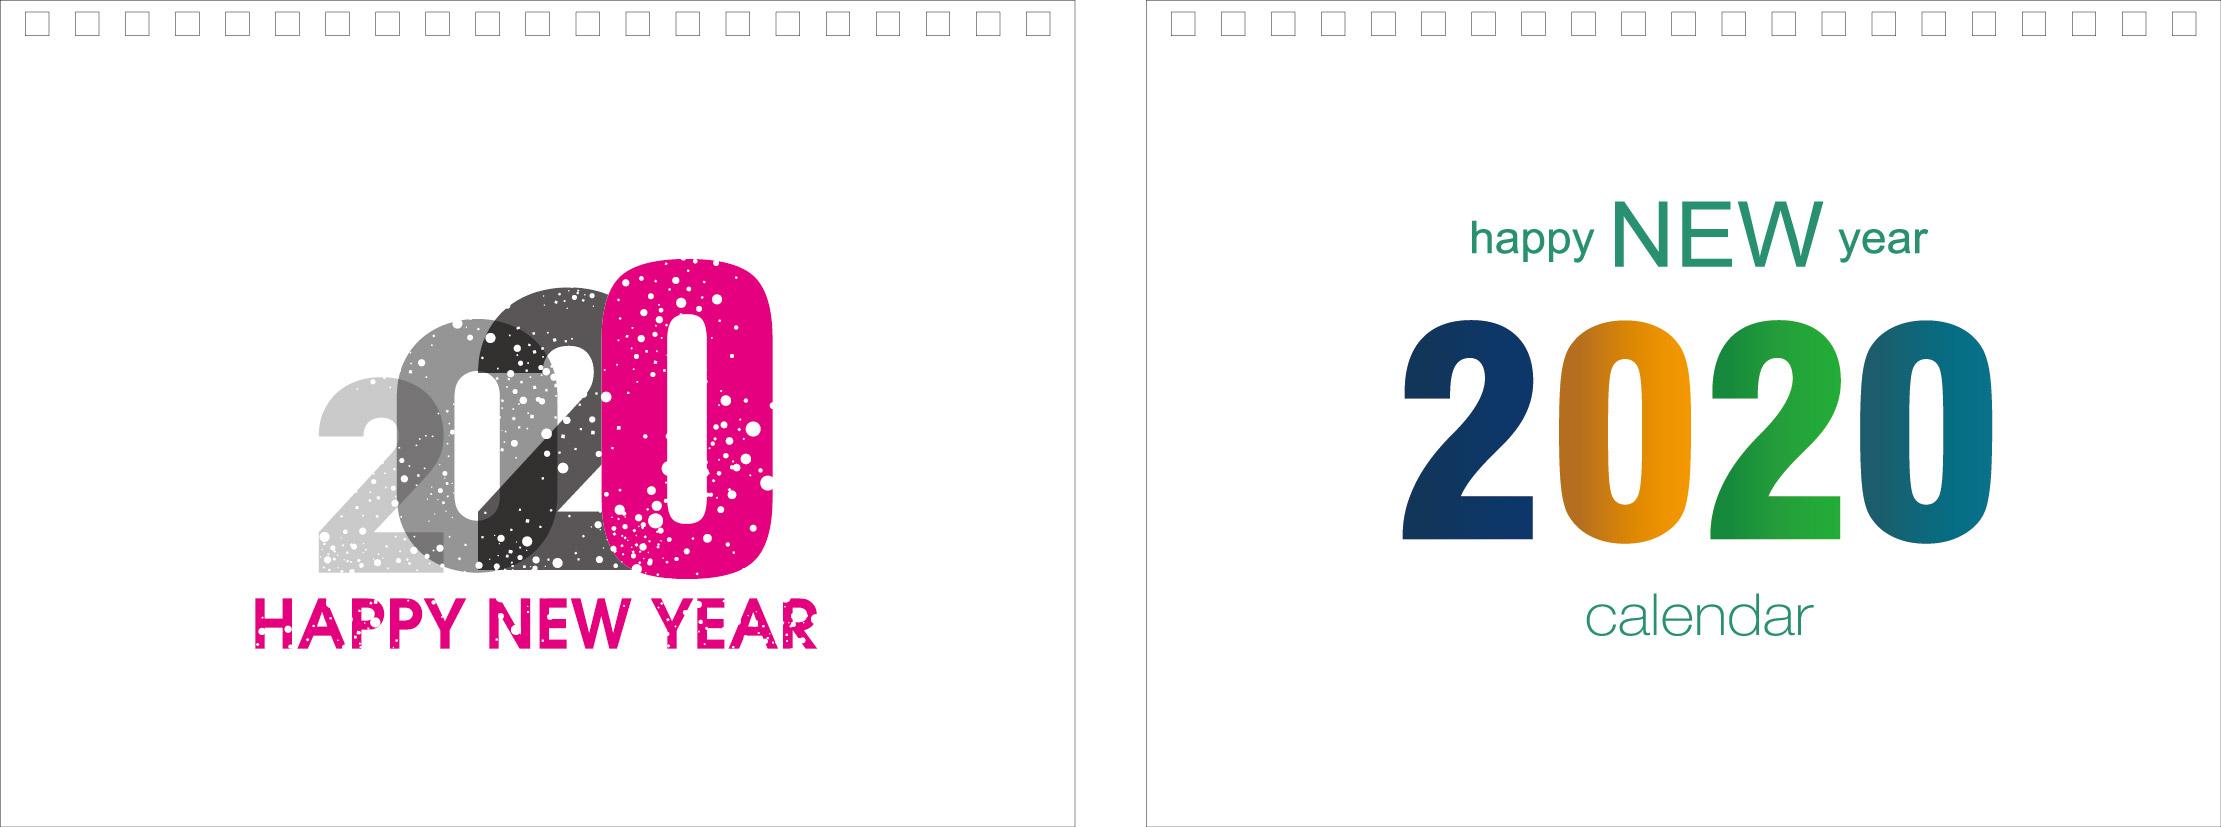 Print100 Desk CalendarB004